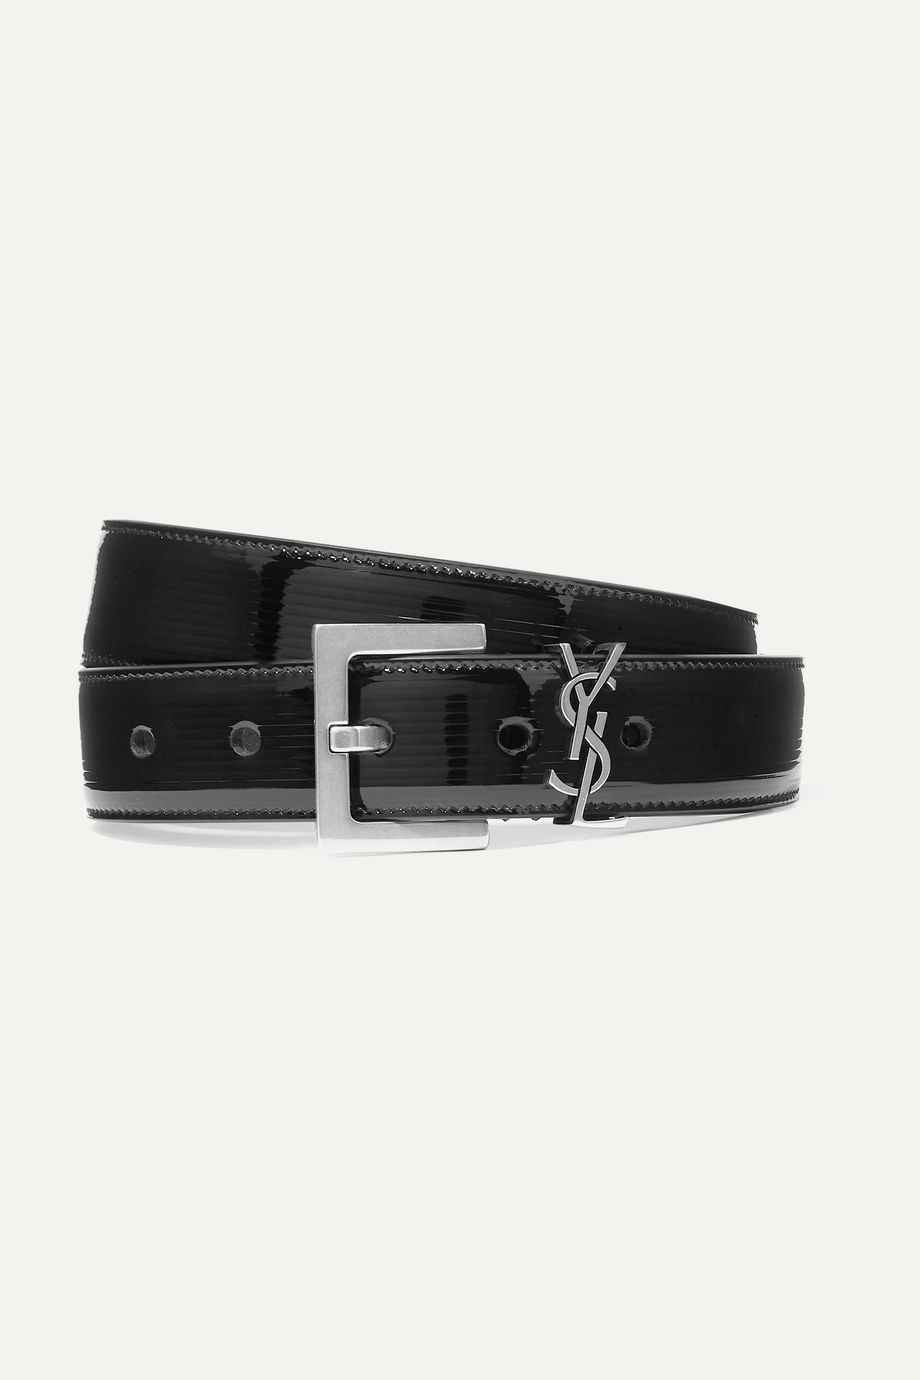 SAINT LAURENT Embellished quilted patent-leather belt